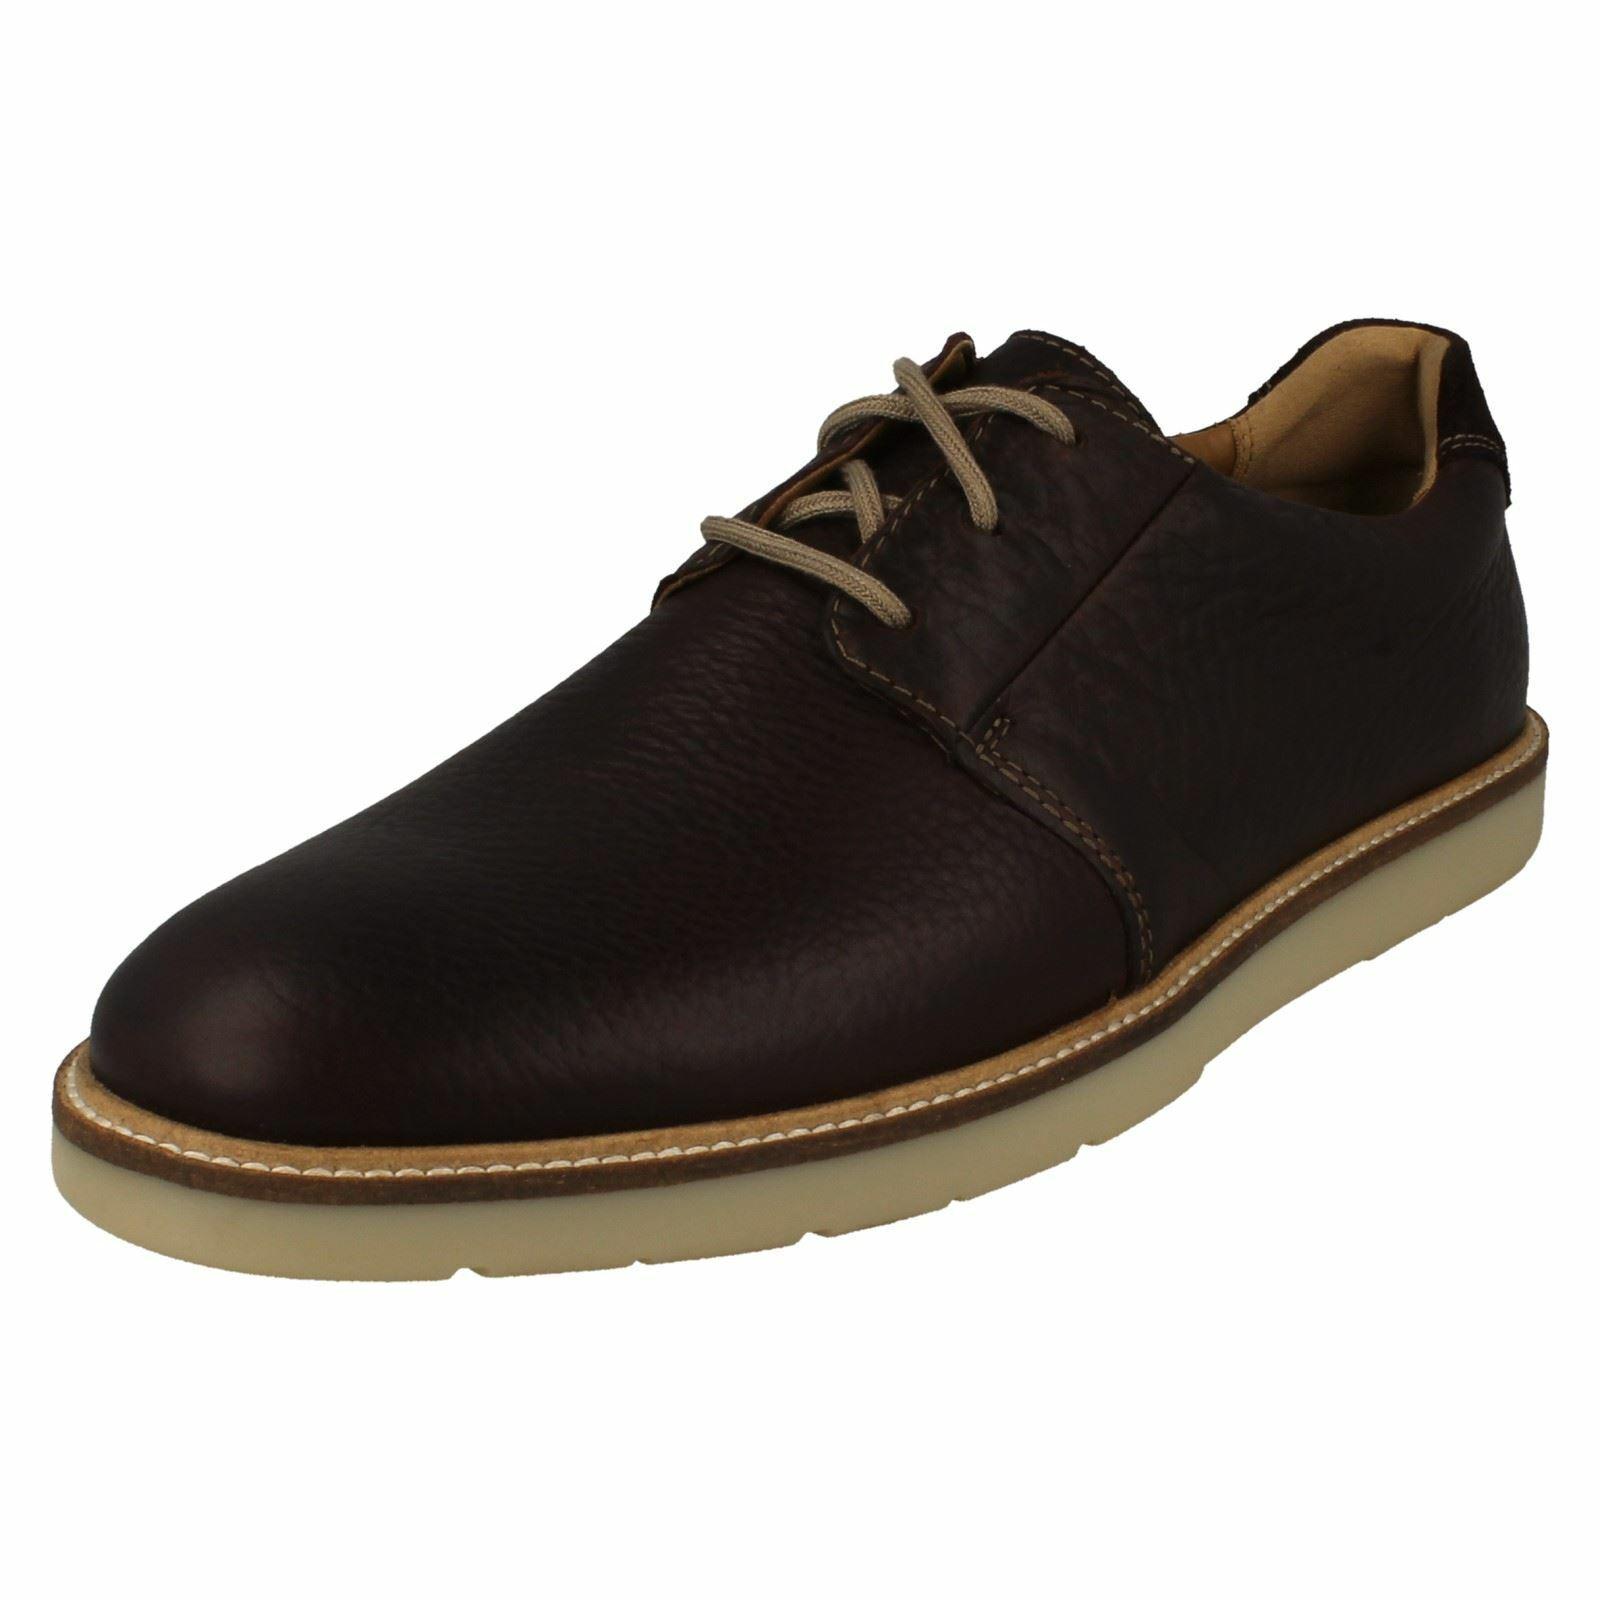 Mens Clarks Formal Casual Lace Up shoes Grandin Plain